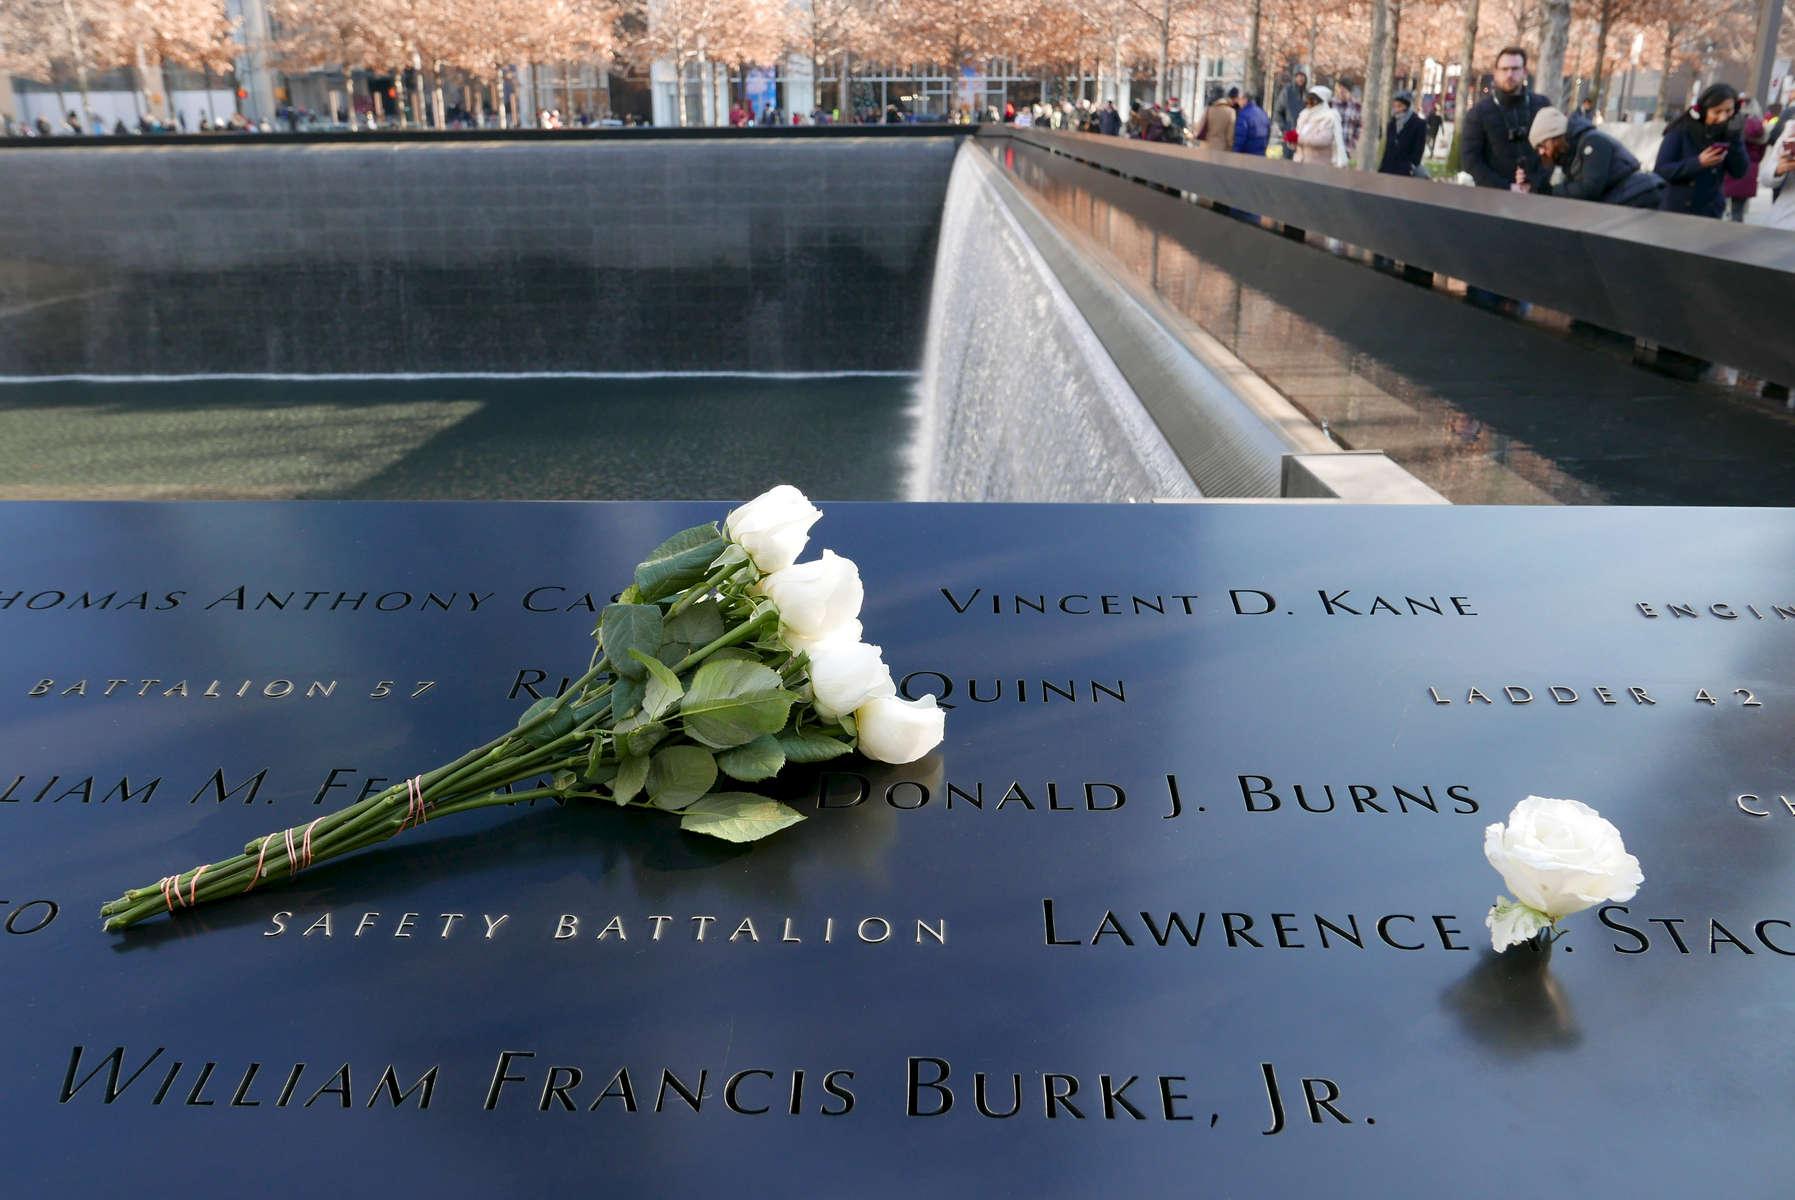 9/11 Memorial, NYC. Jon Chase photo